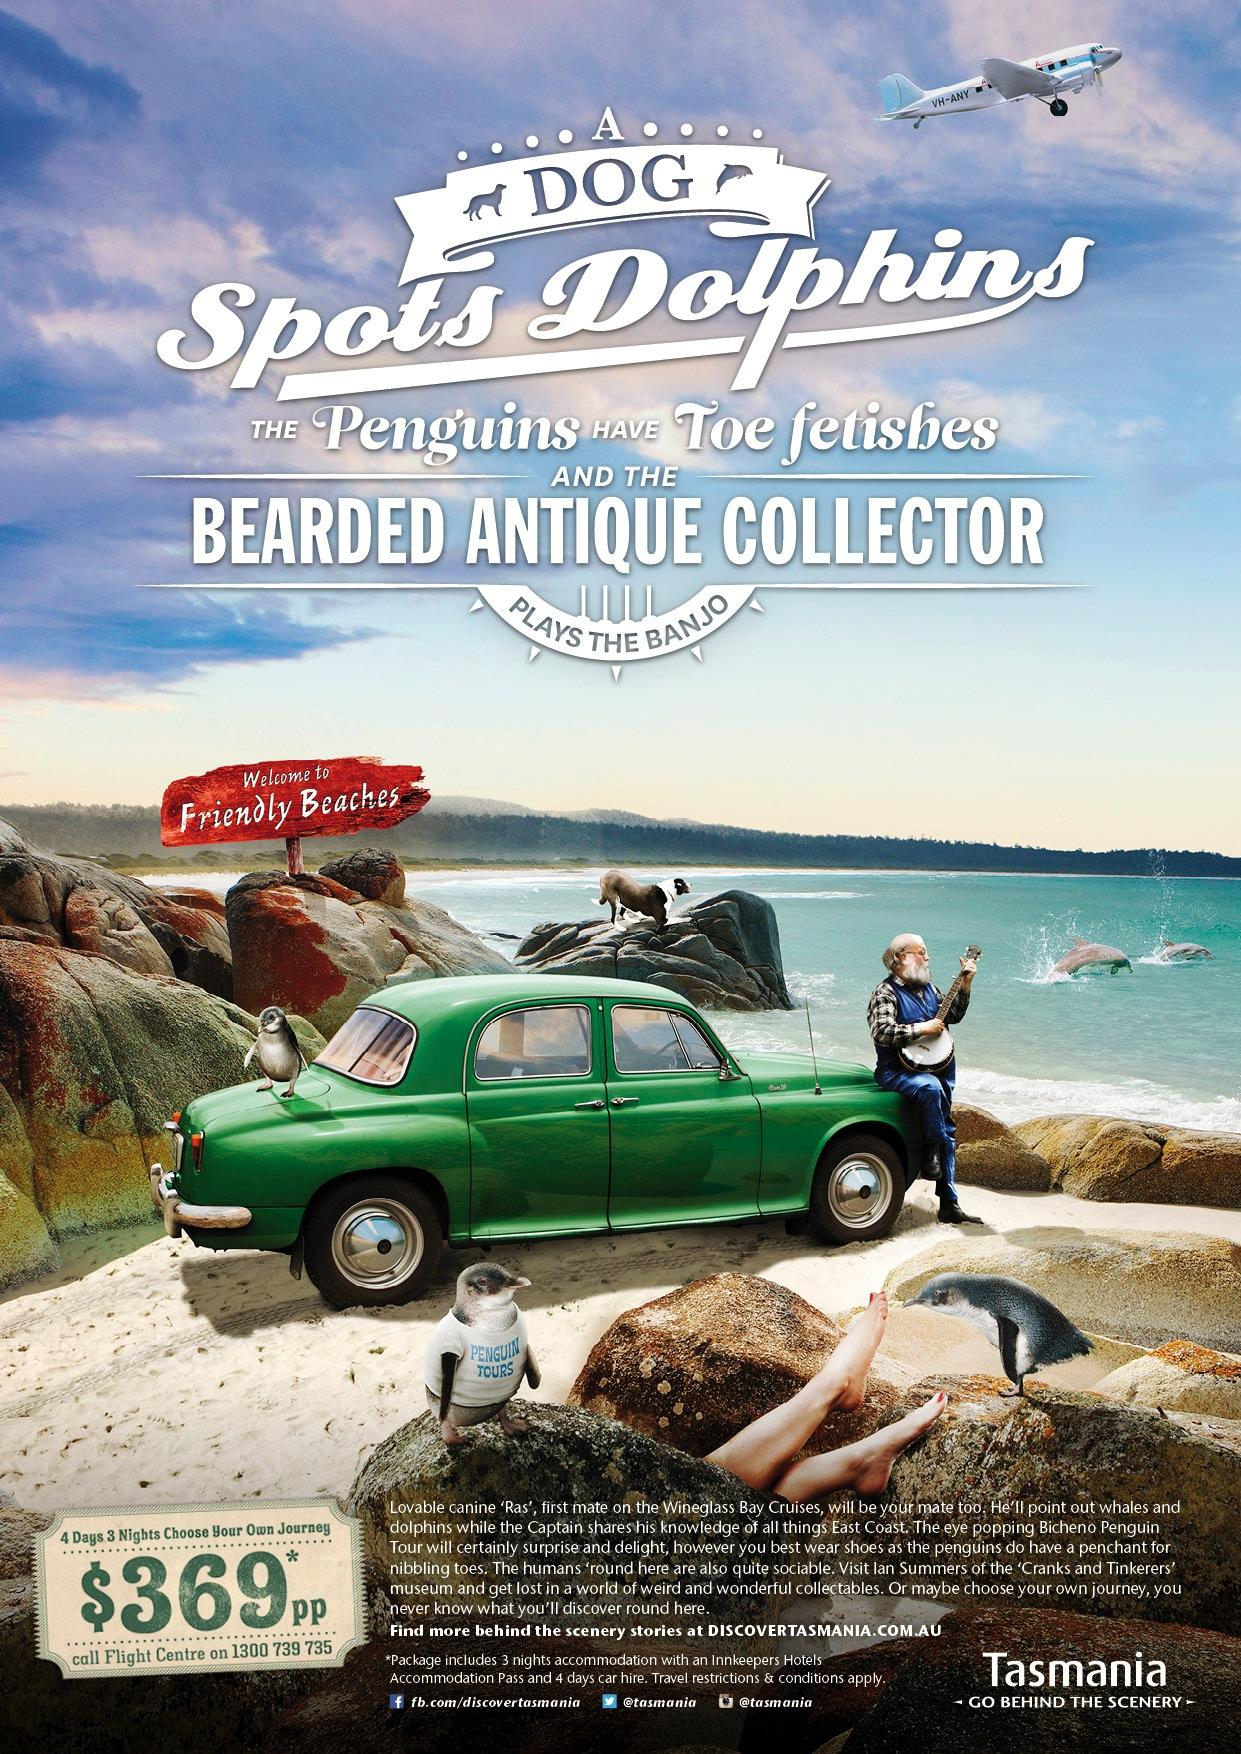 Tourism Tasmania Print Ad -  Toe fetish